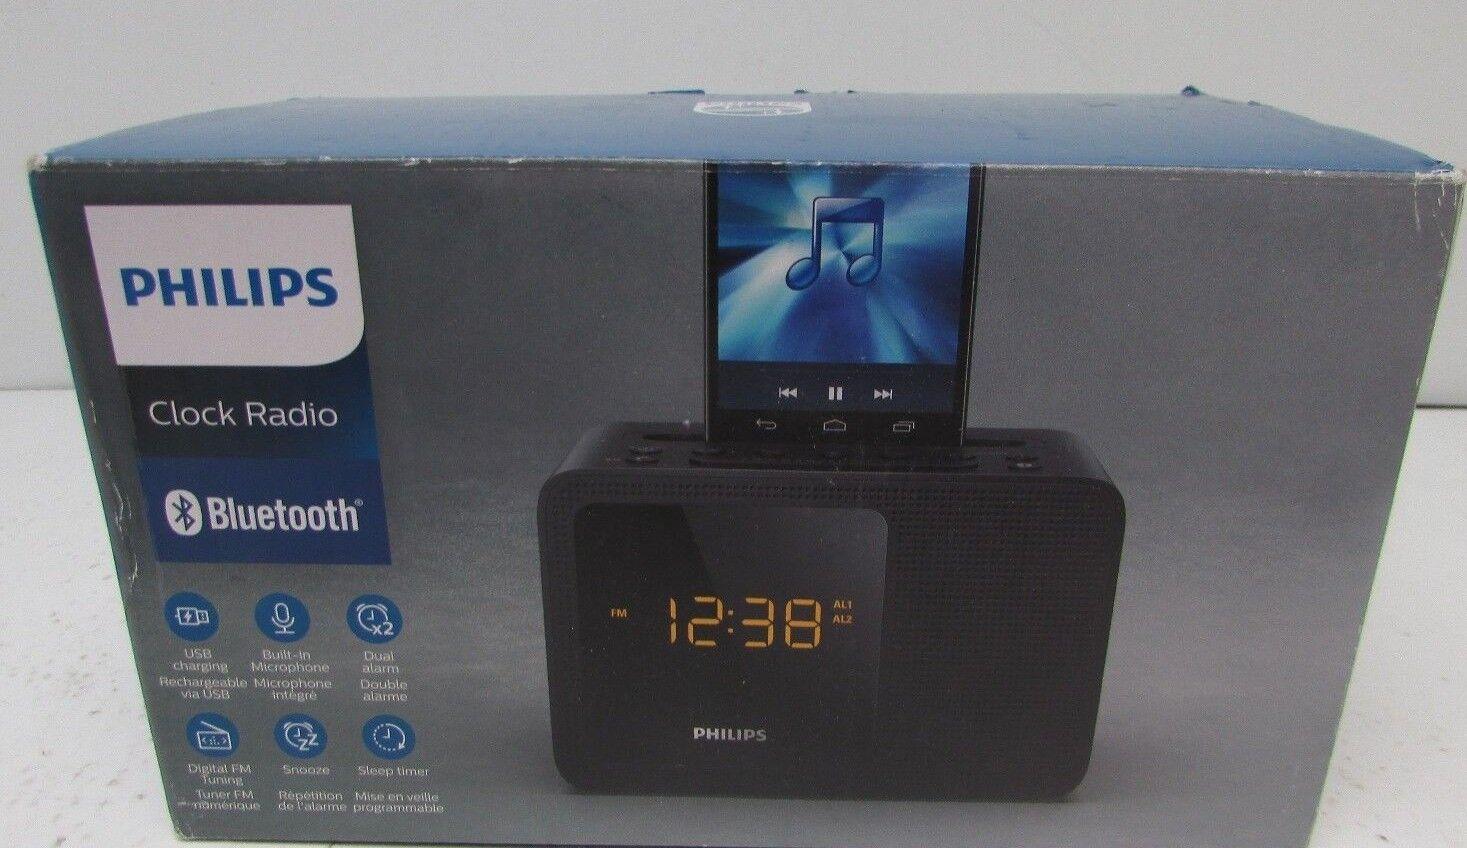 Philips AJT5300/37 Dual Alarm Bluetooth Clock Radio